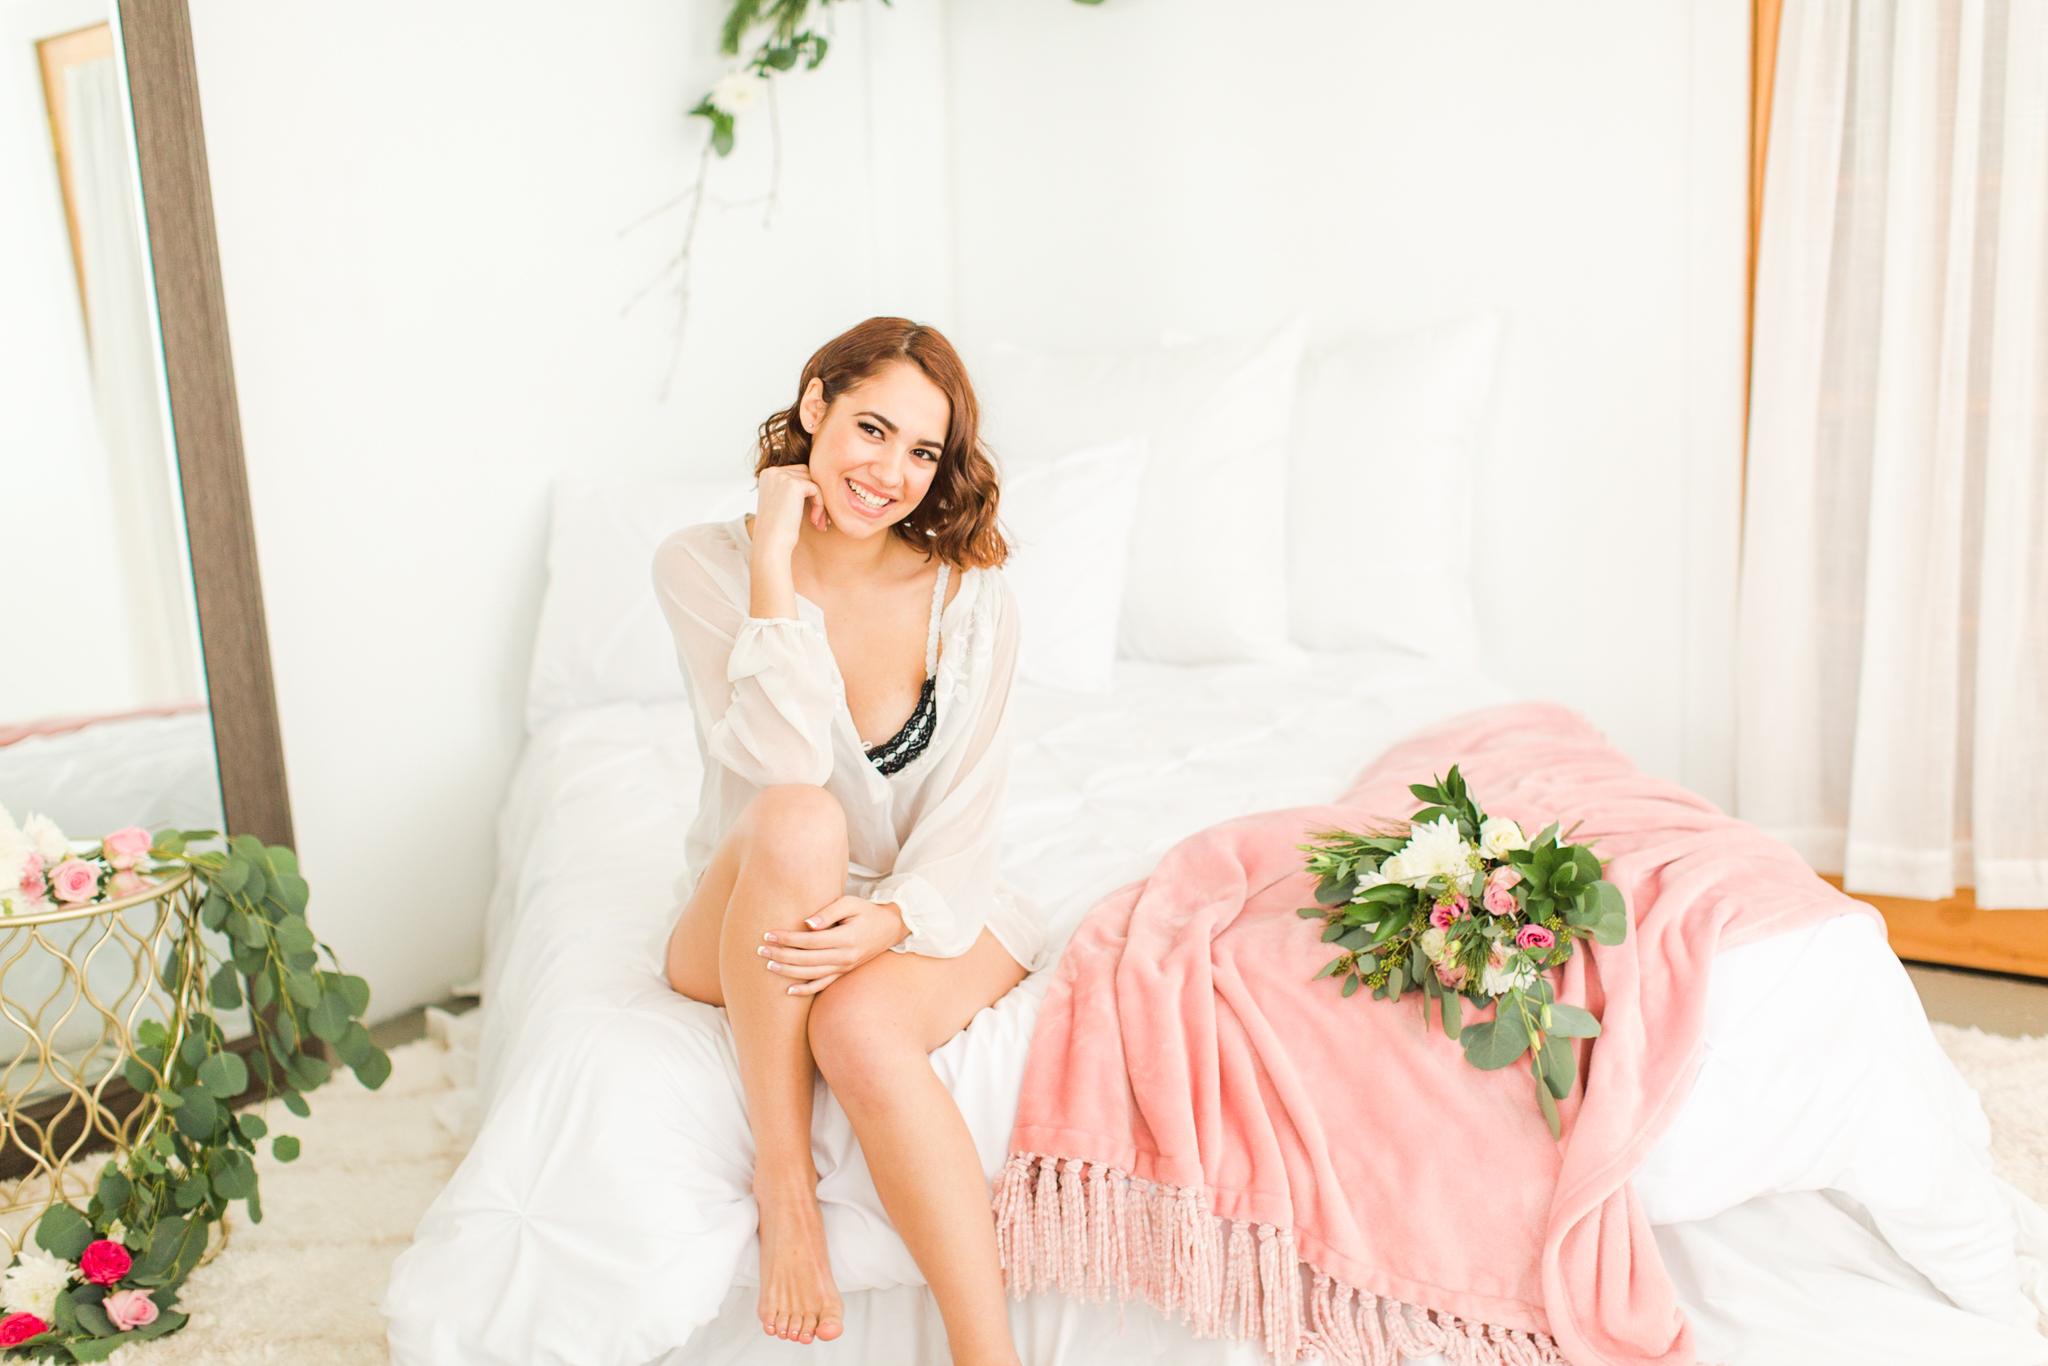 Bridal Boudoir - Shaina Lee Photography WEB-200.jpg